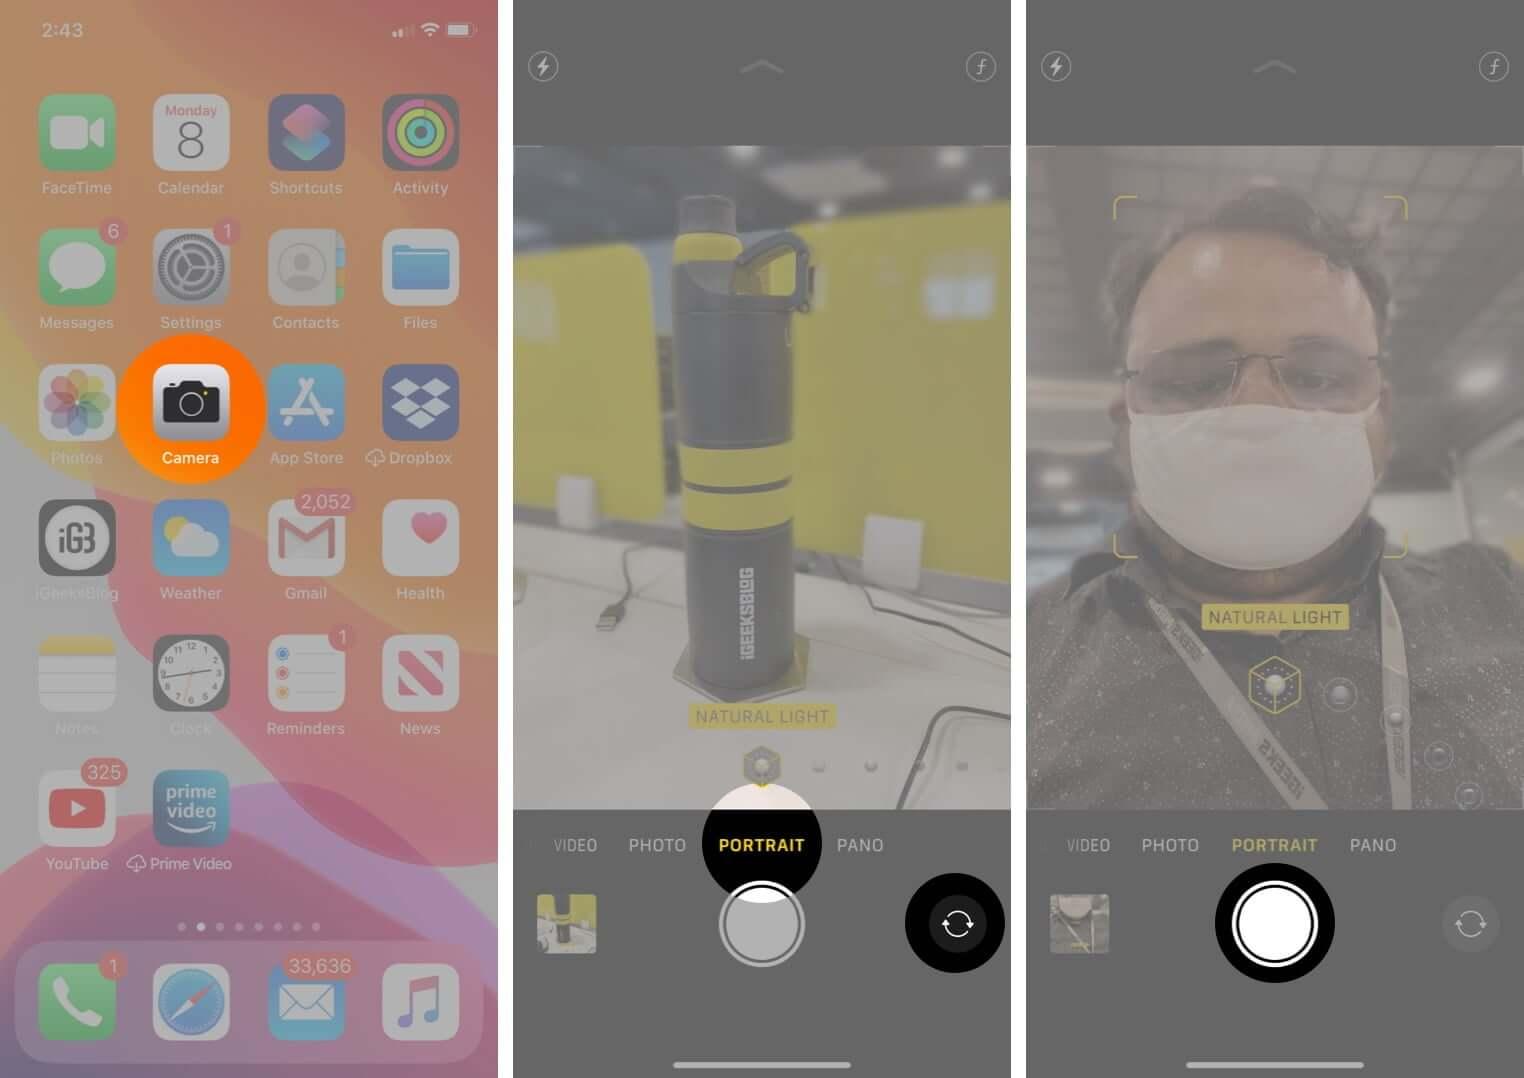 take portrait mode selfie on iphone